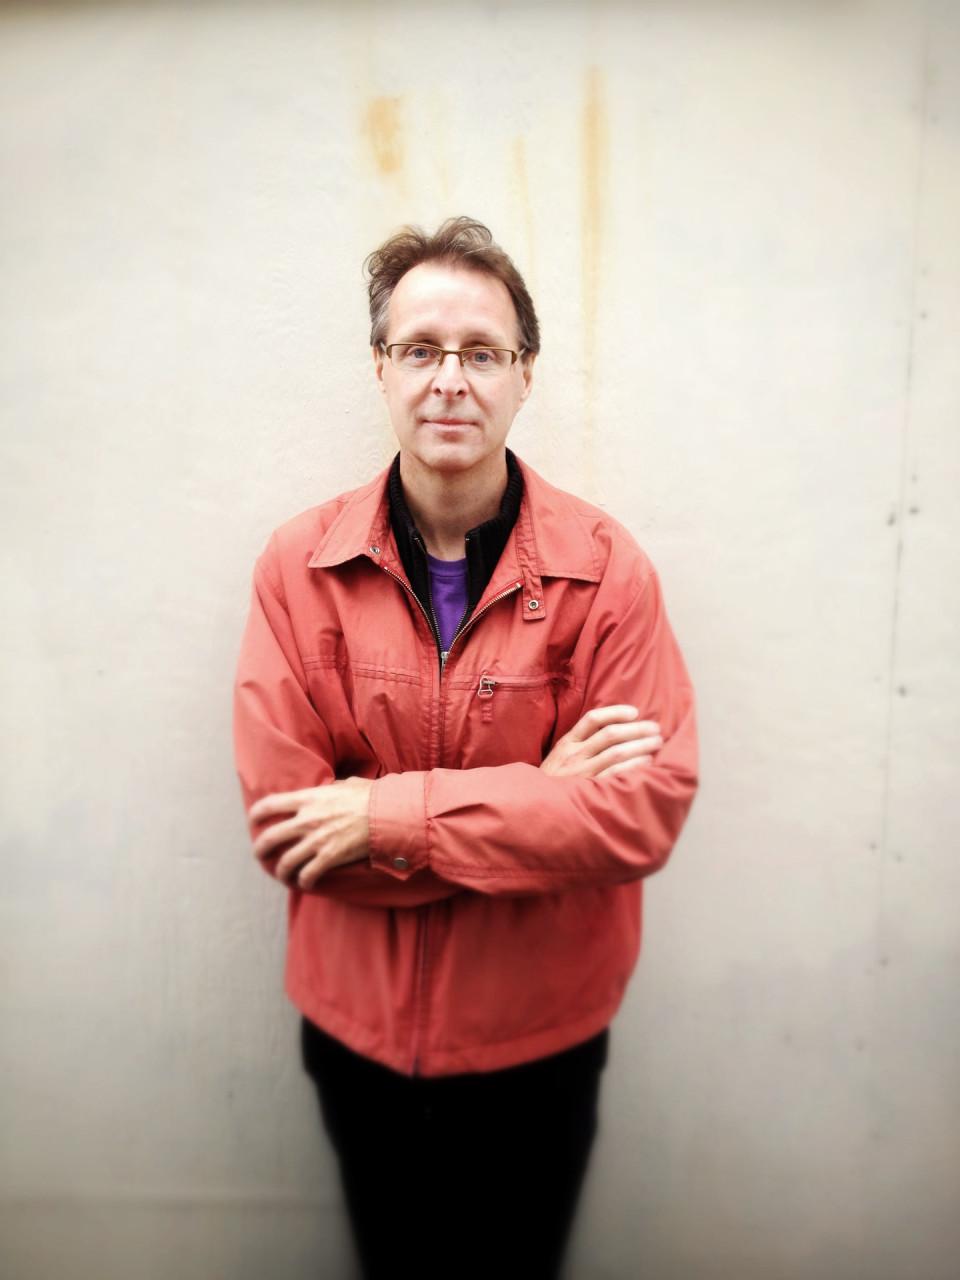 Jean-François Denis [Photo: Mark Mushet, Vancouver (British Columbia, Canada), June 20, 2013]